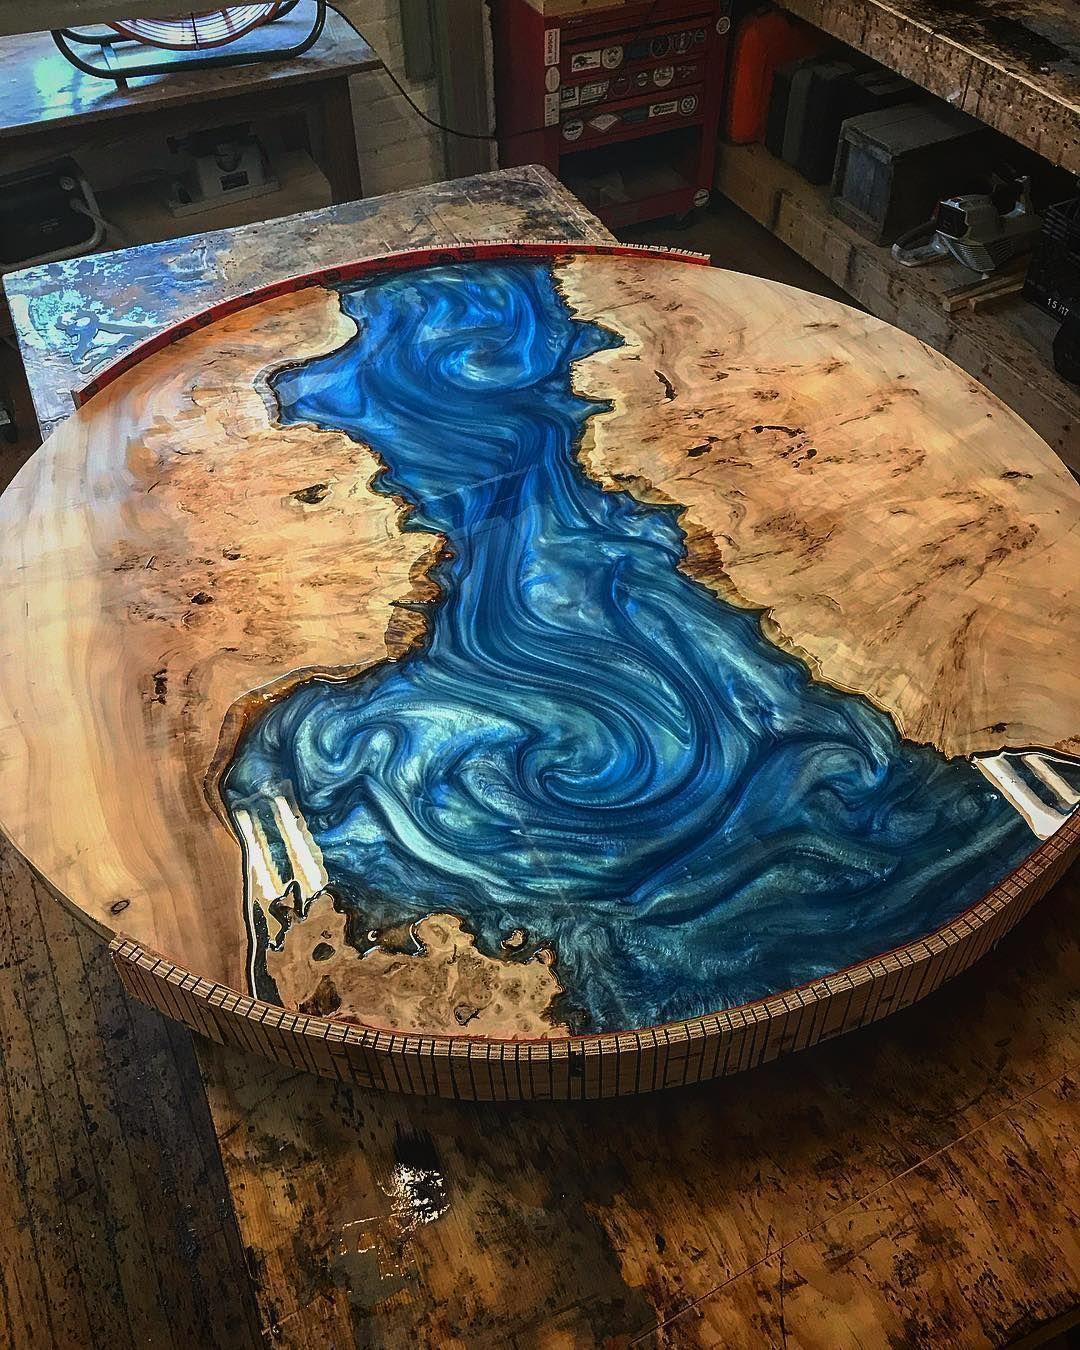 World On On Your Table Circular Table Design Blue Ocean